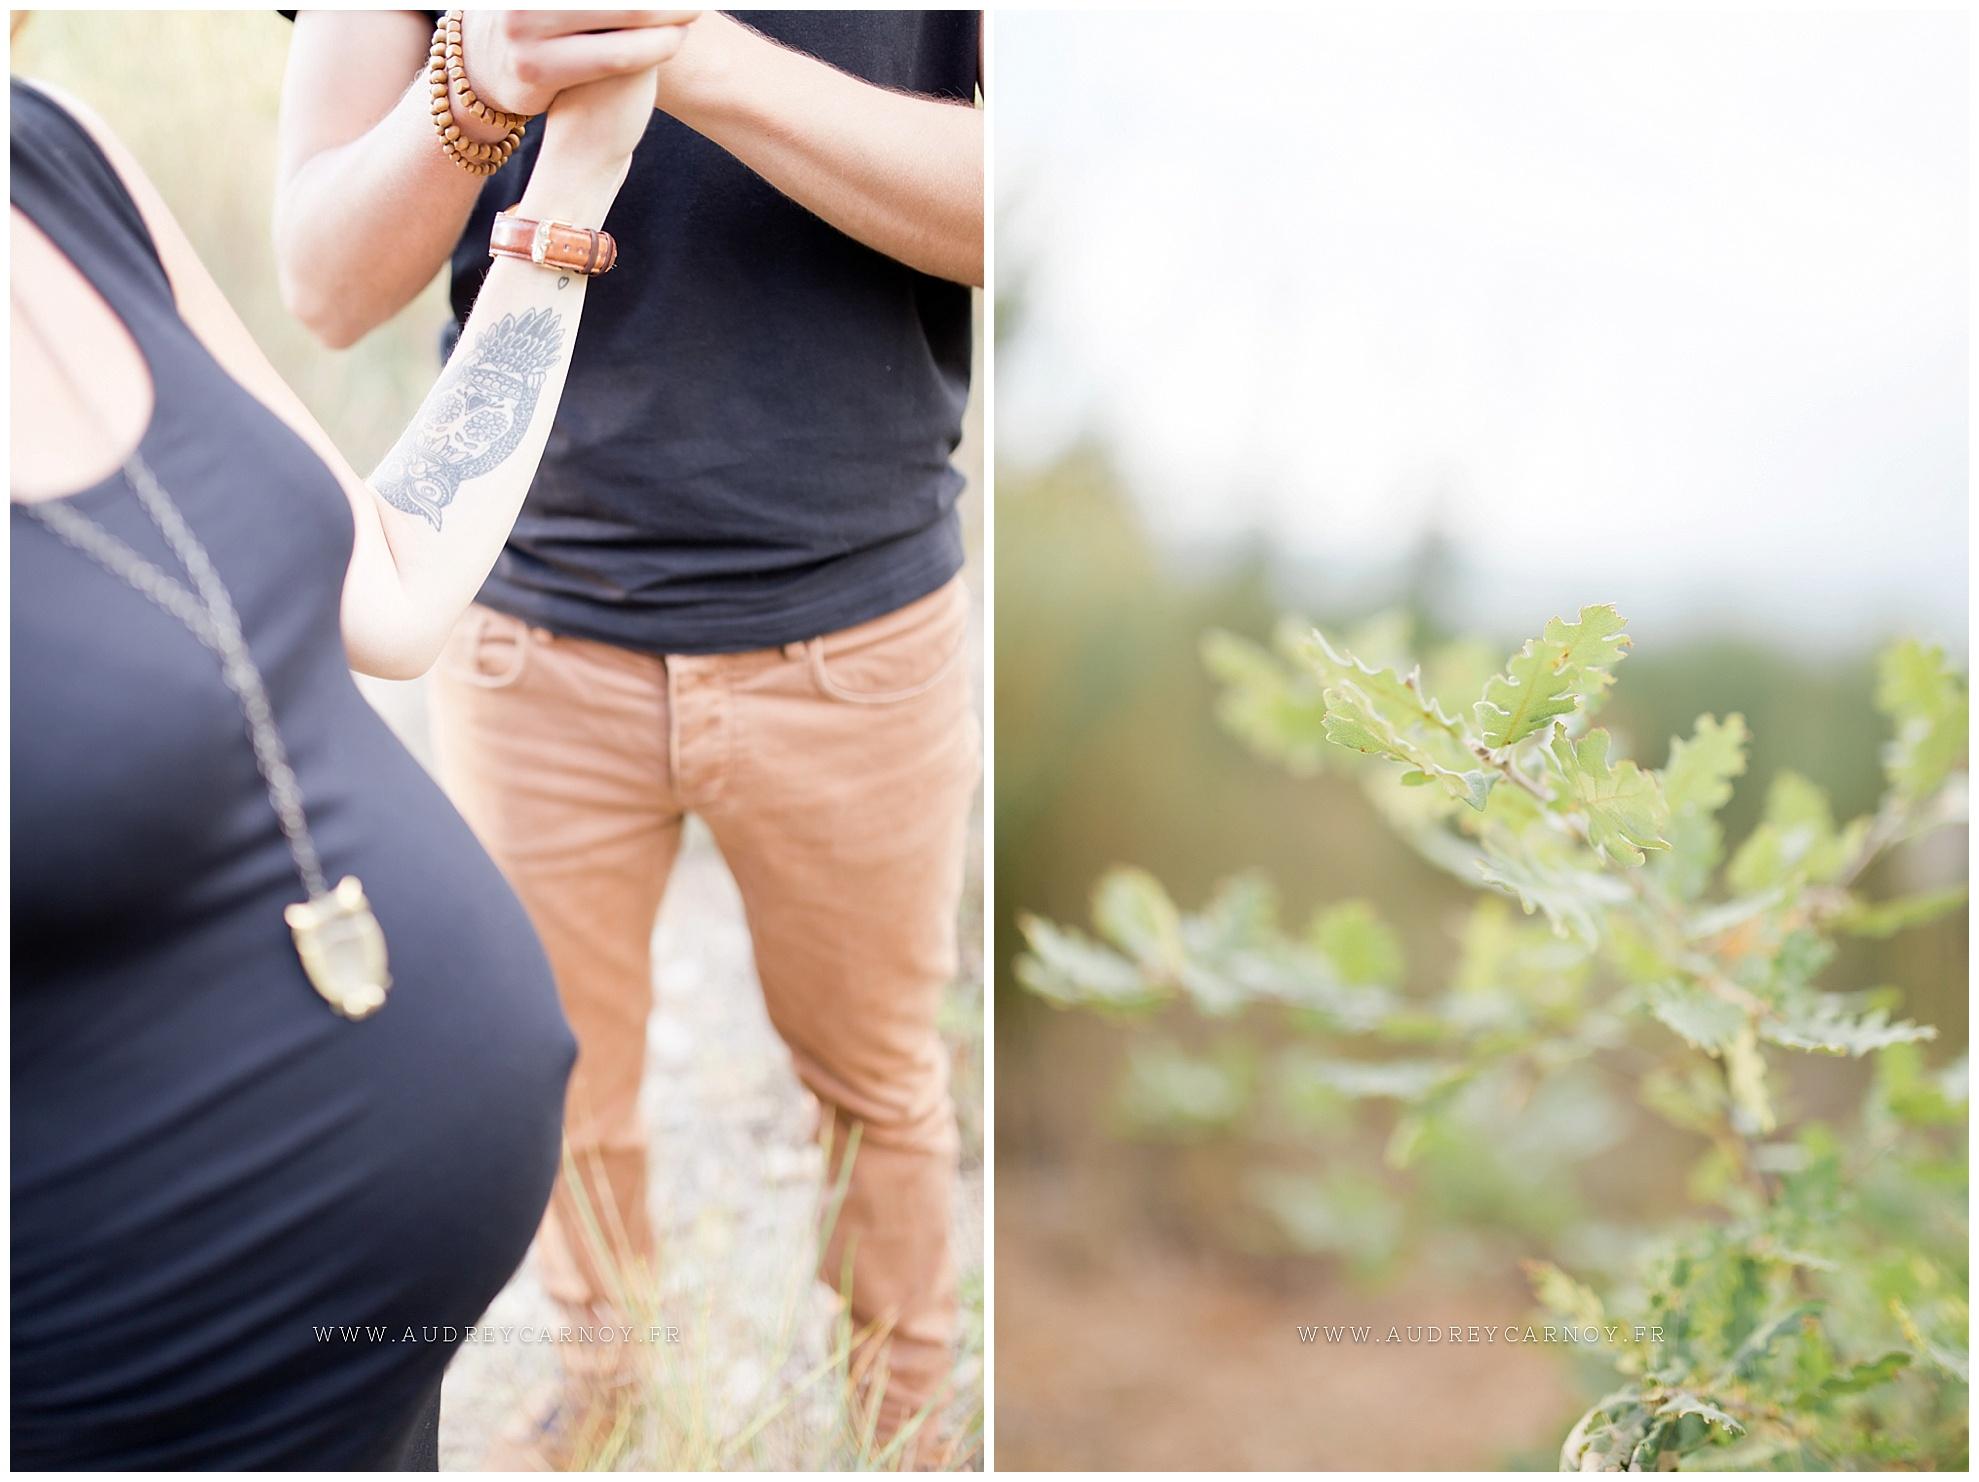 Seance grossesse Provence - Pertuis | Audrey & Jerome 4